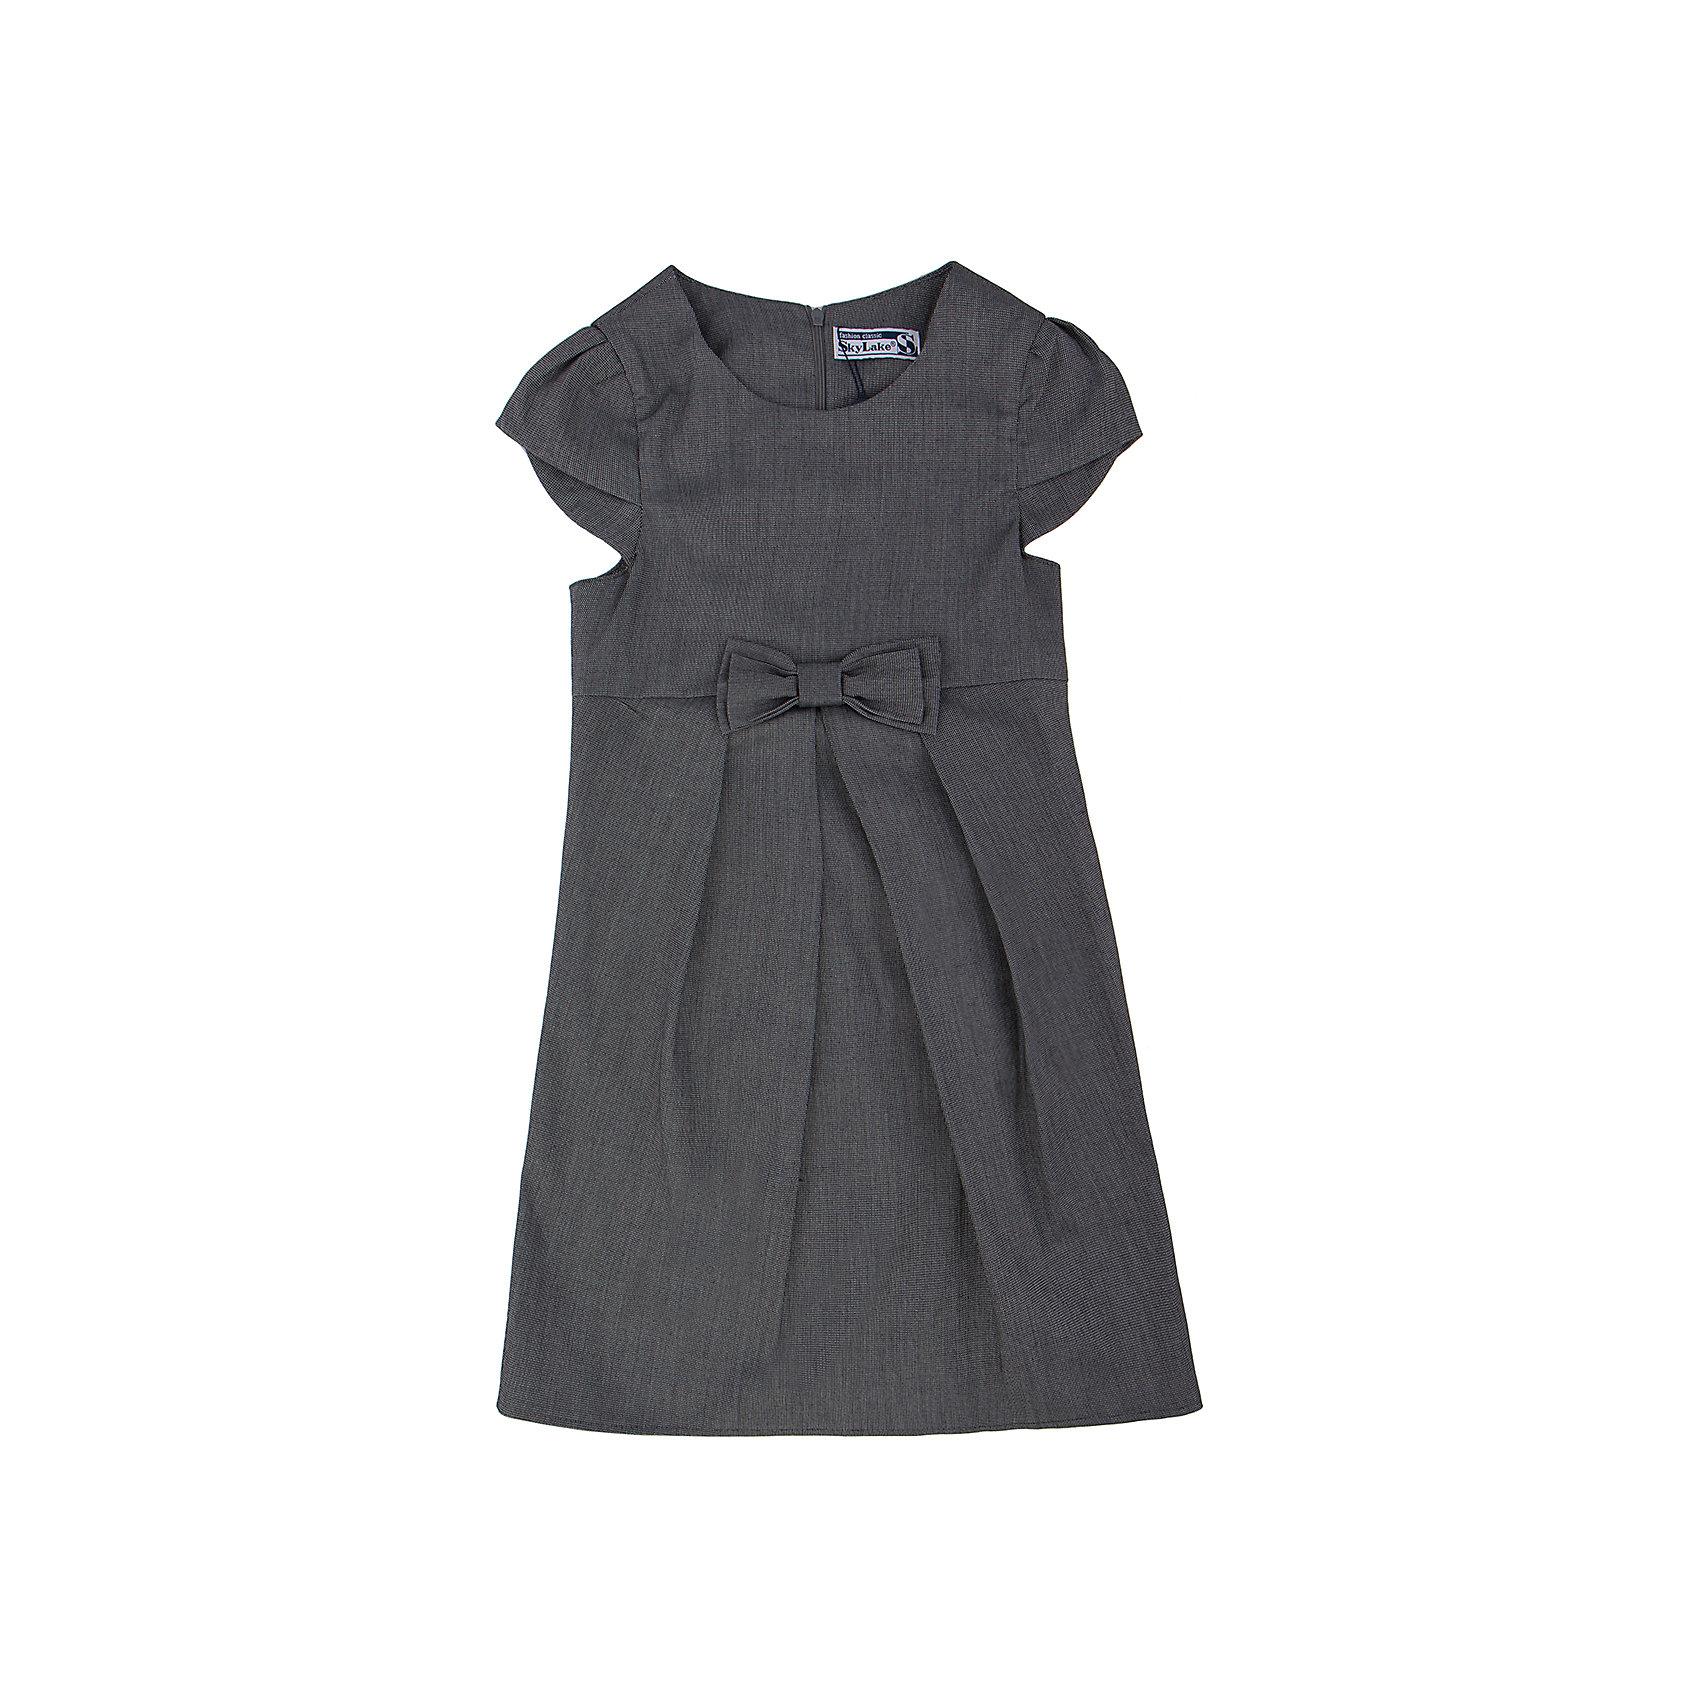 Skylake Сарафан для девочки Кембридж Skylake skylake юбка для девочки агат skylake